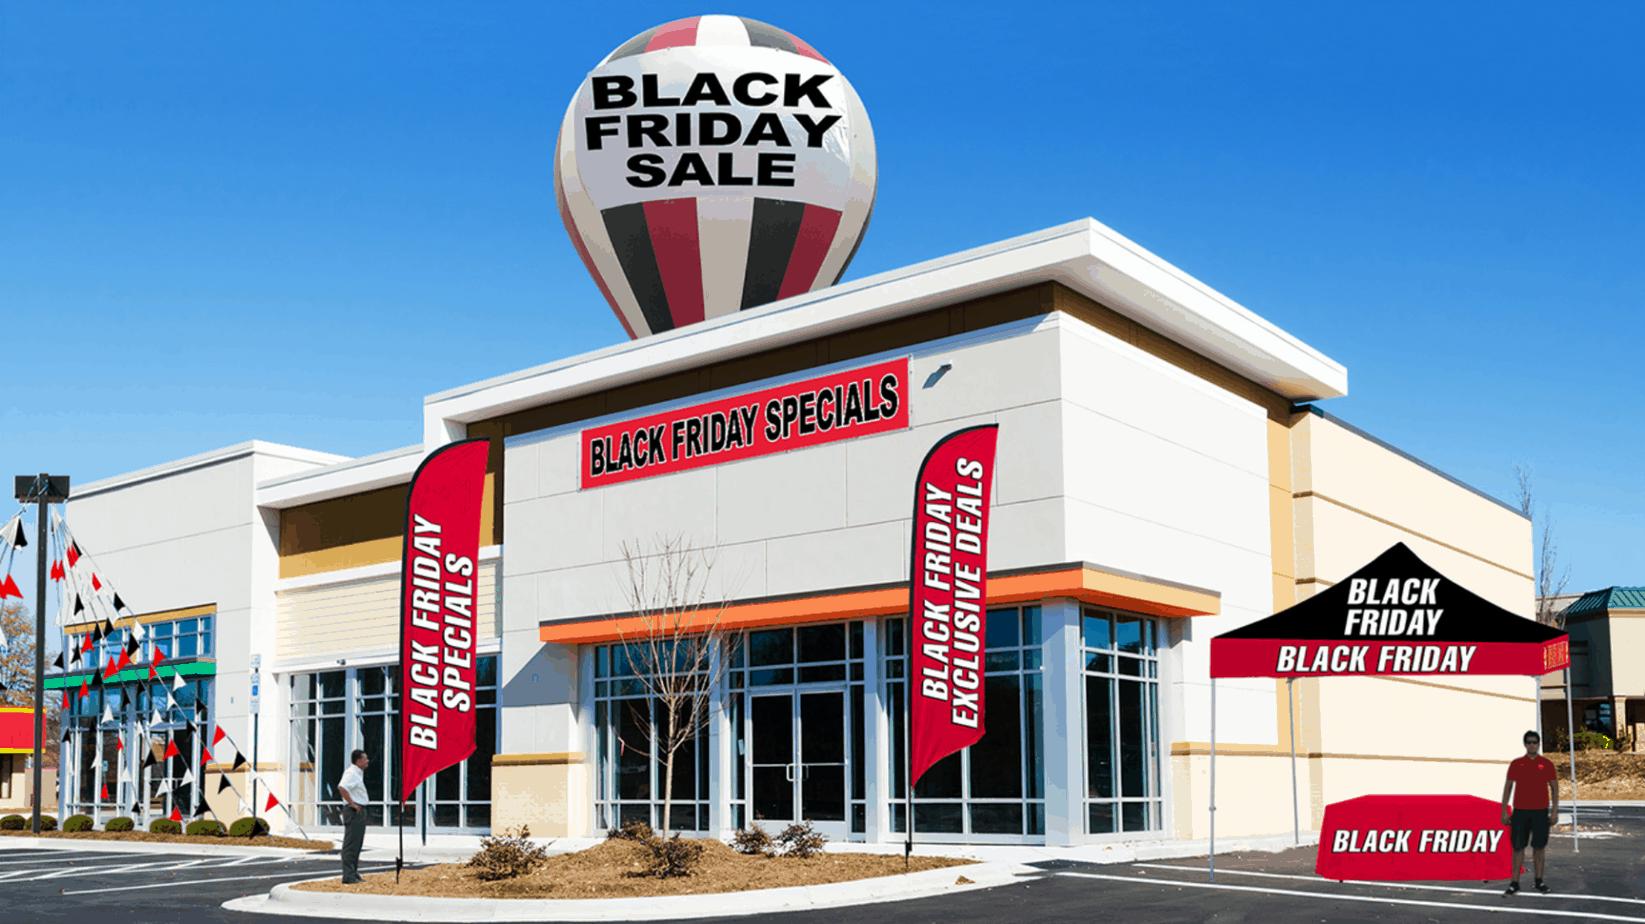 black friday store image